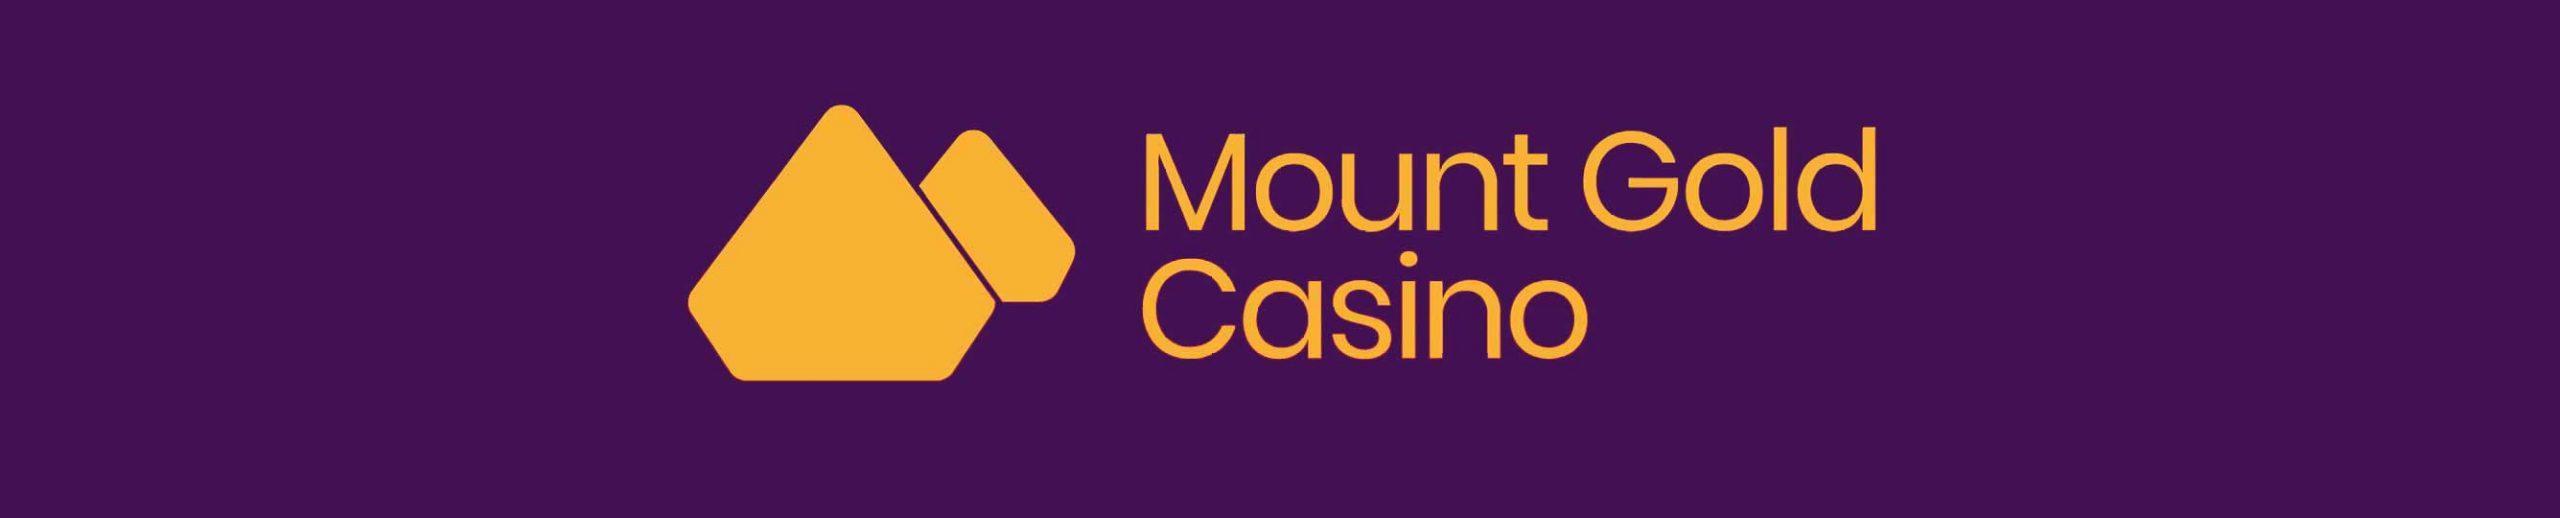 Mount-Gold-Casino-Feature